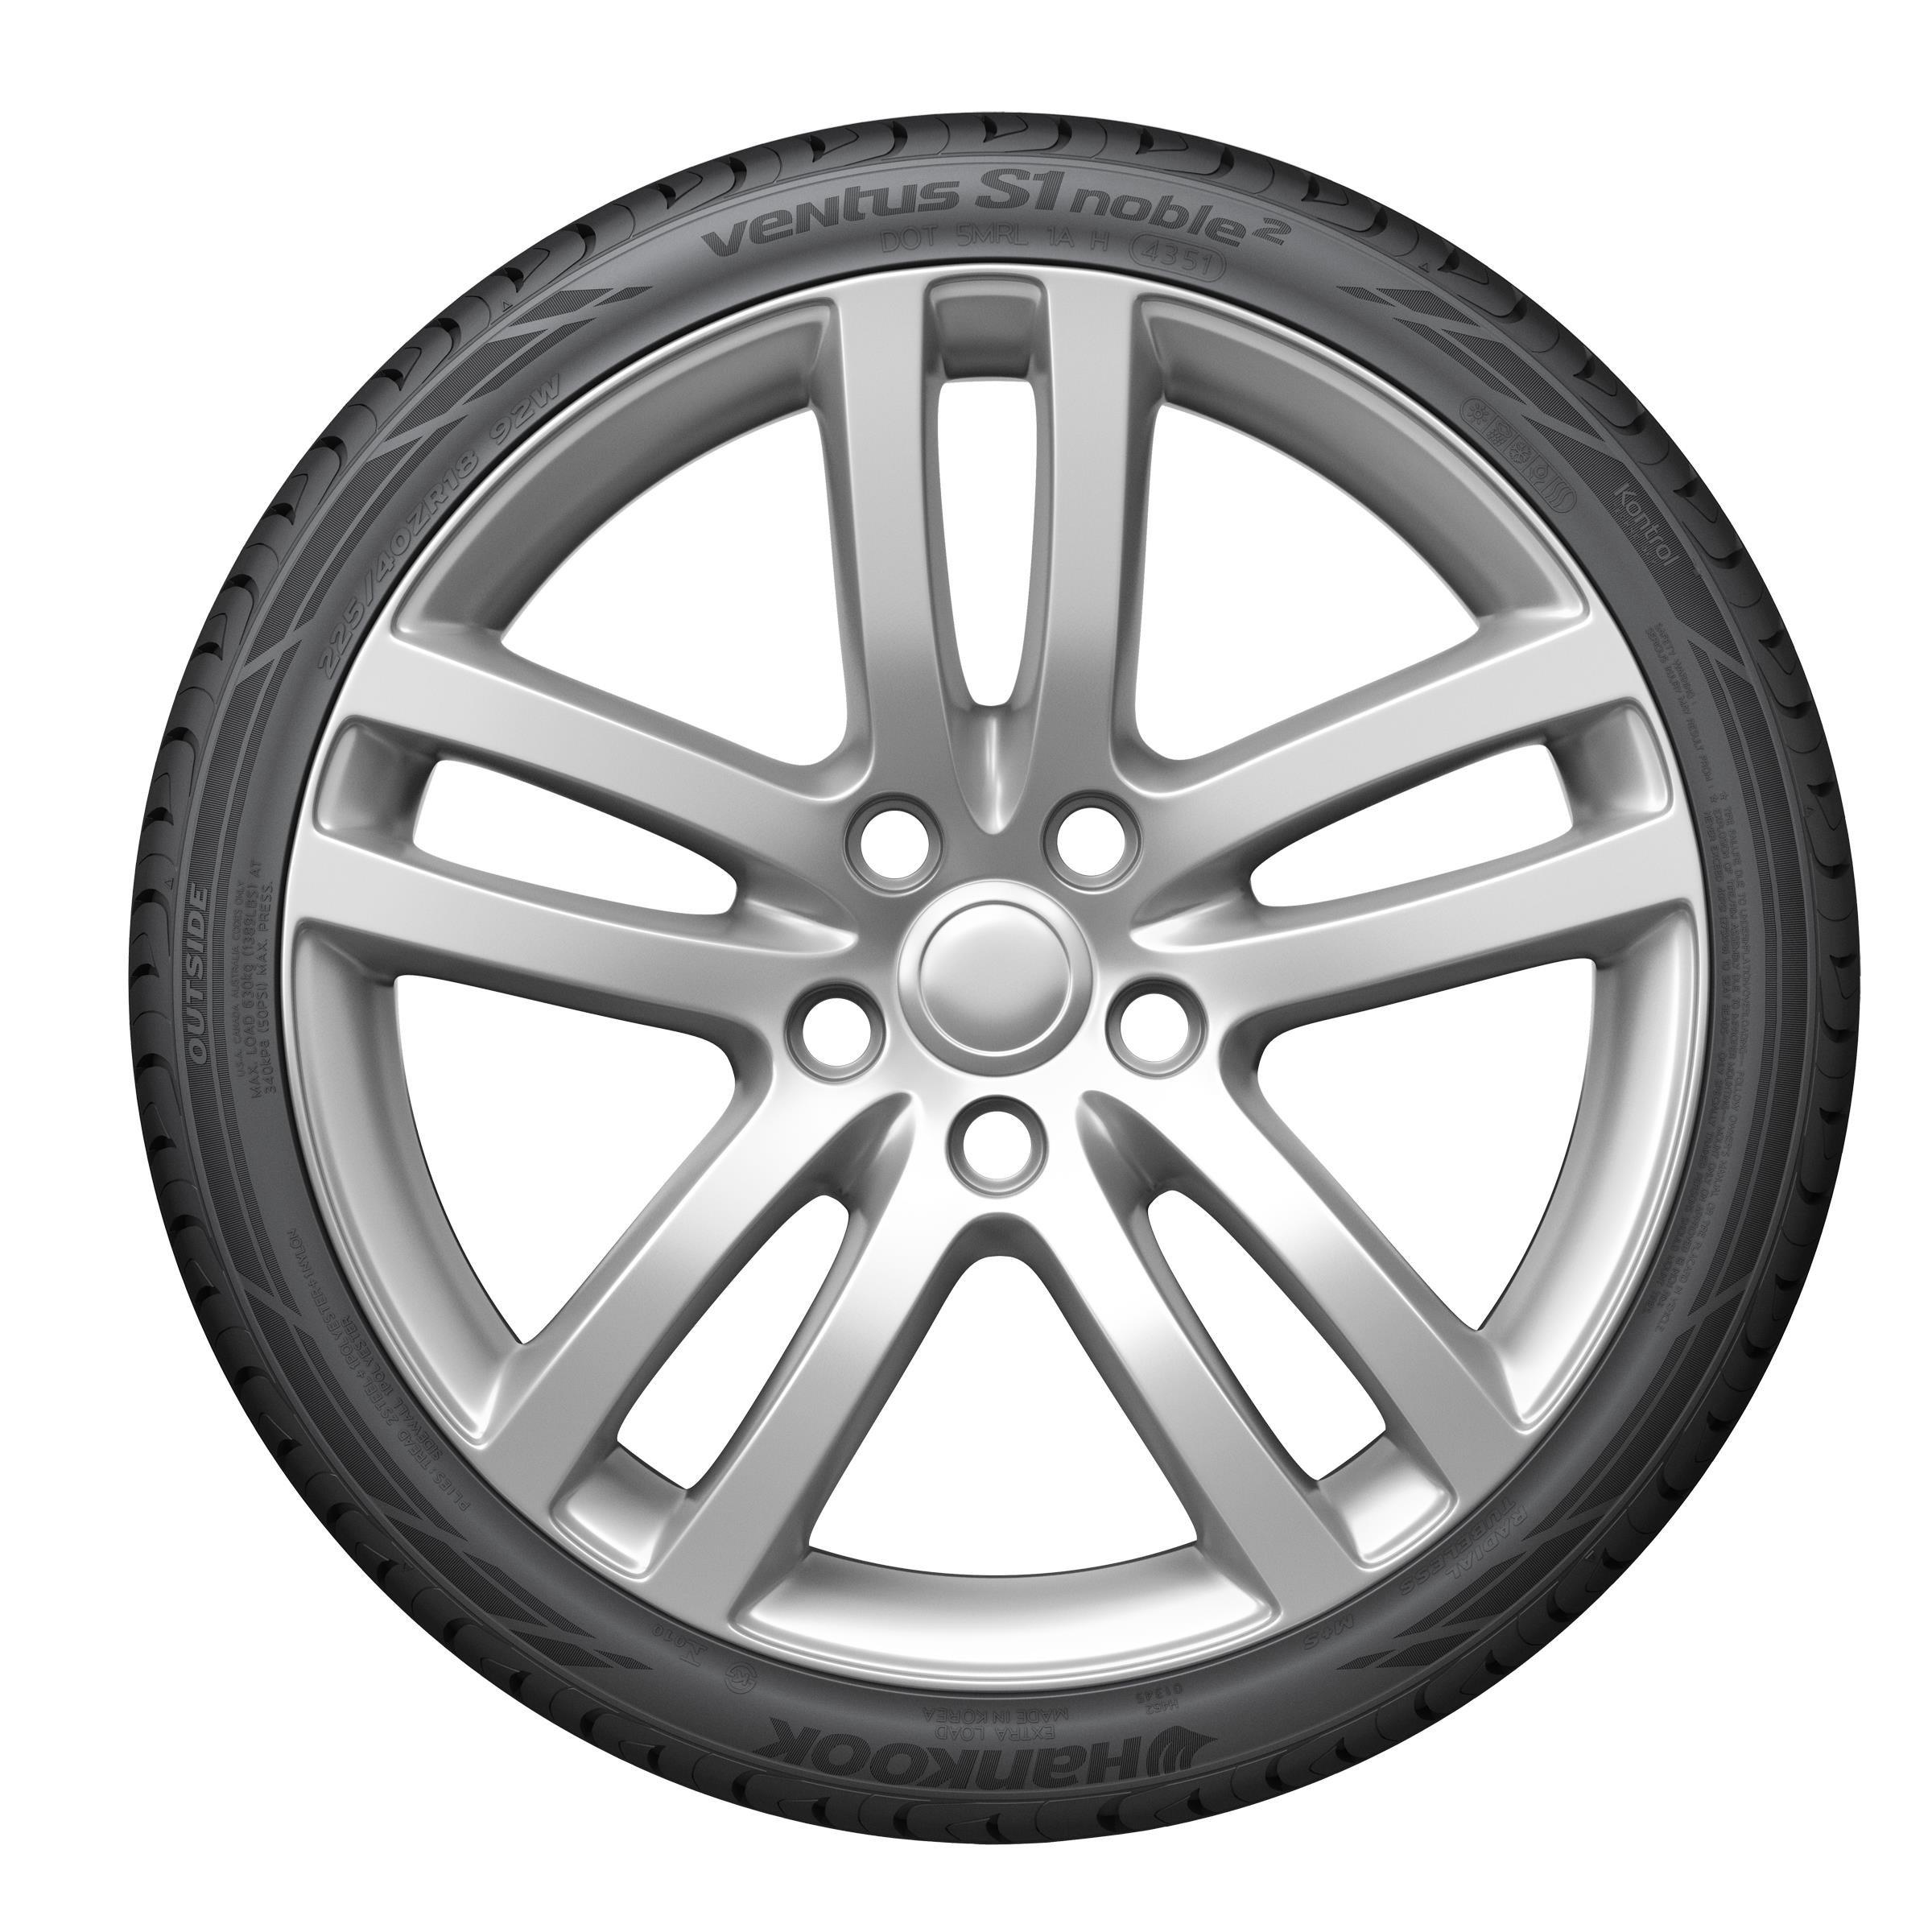 Hankook Ventus S1 Noble2 Performance Radial Tire - 225/40R18 92W